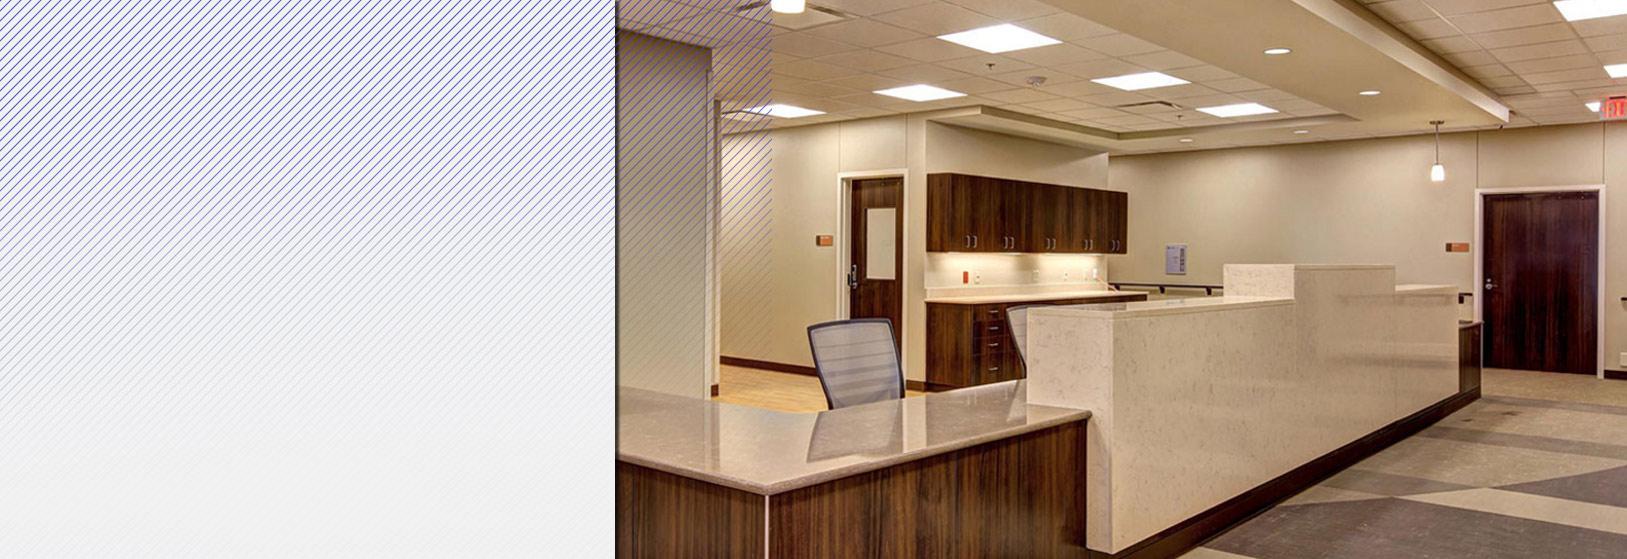 Photo of McCamey County Hospital Inpatient facility